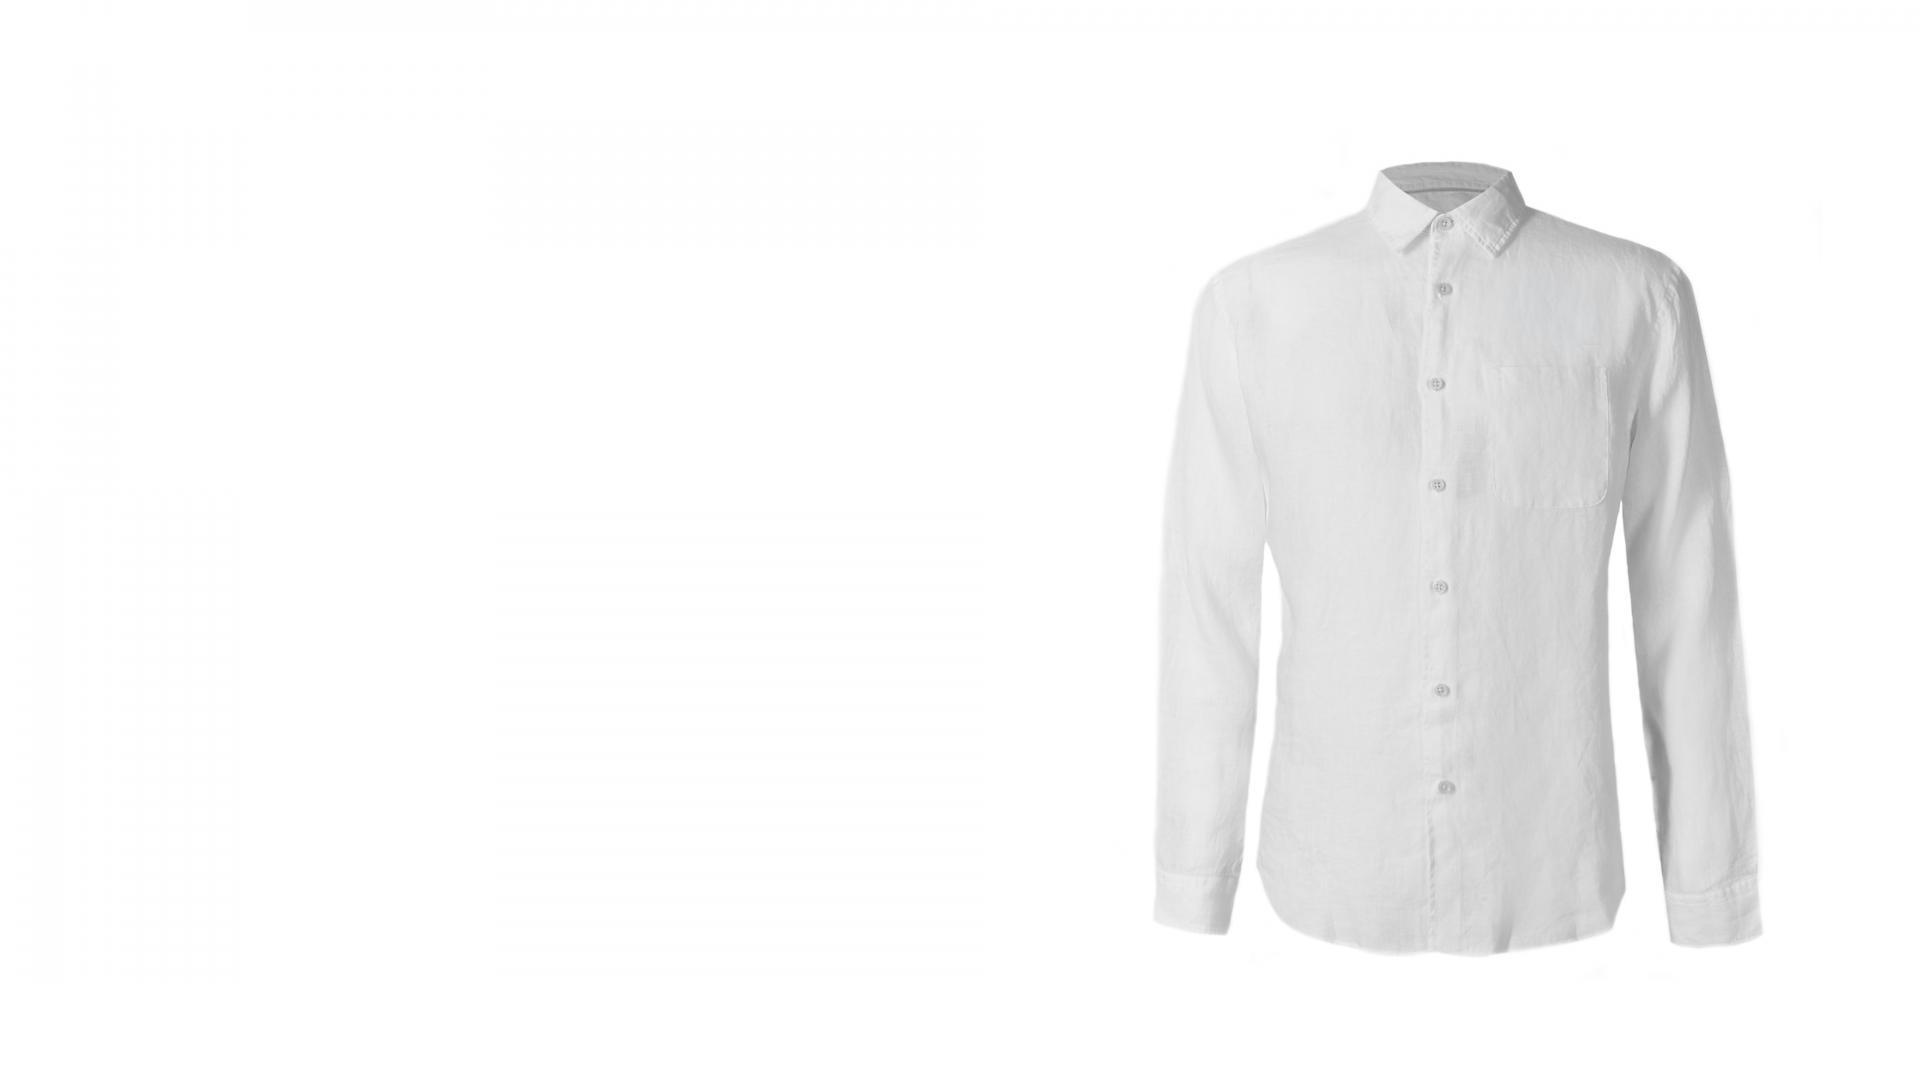 Pure Linen Shirt - Big Brother 2017